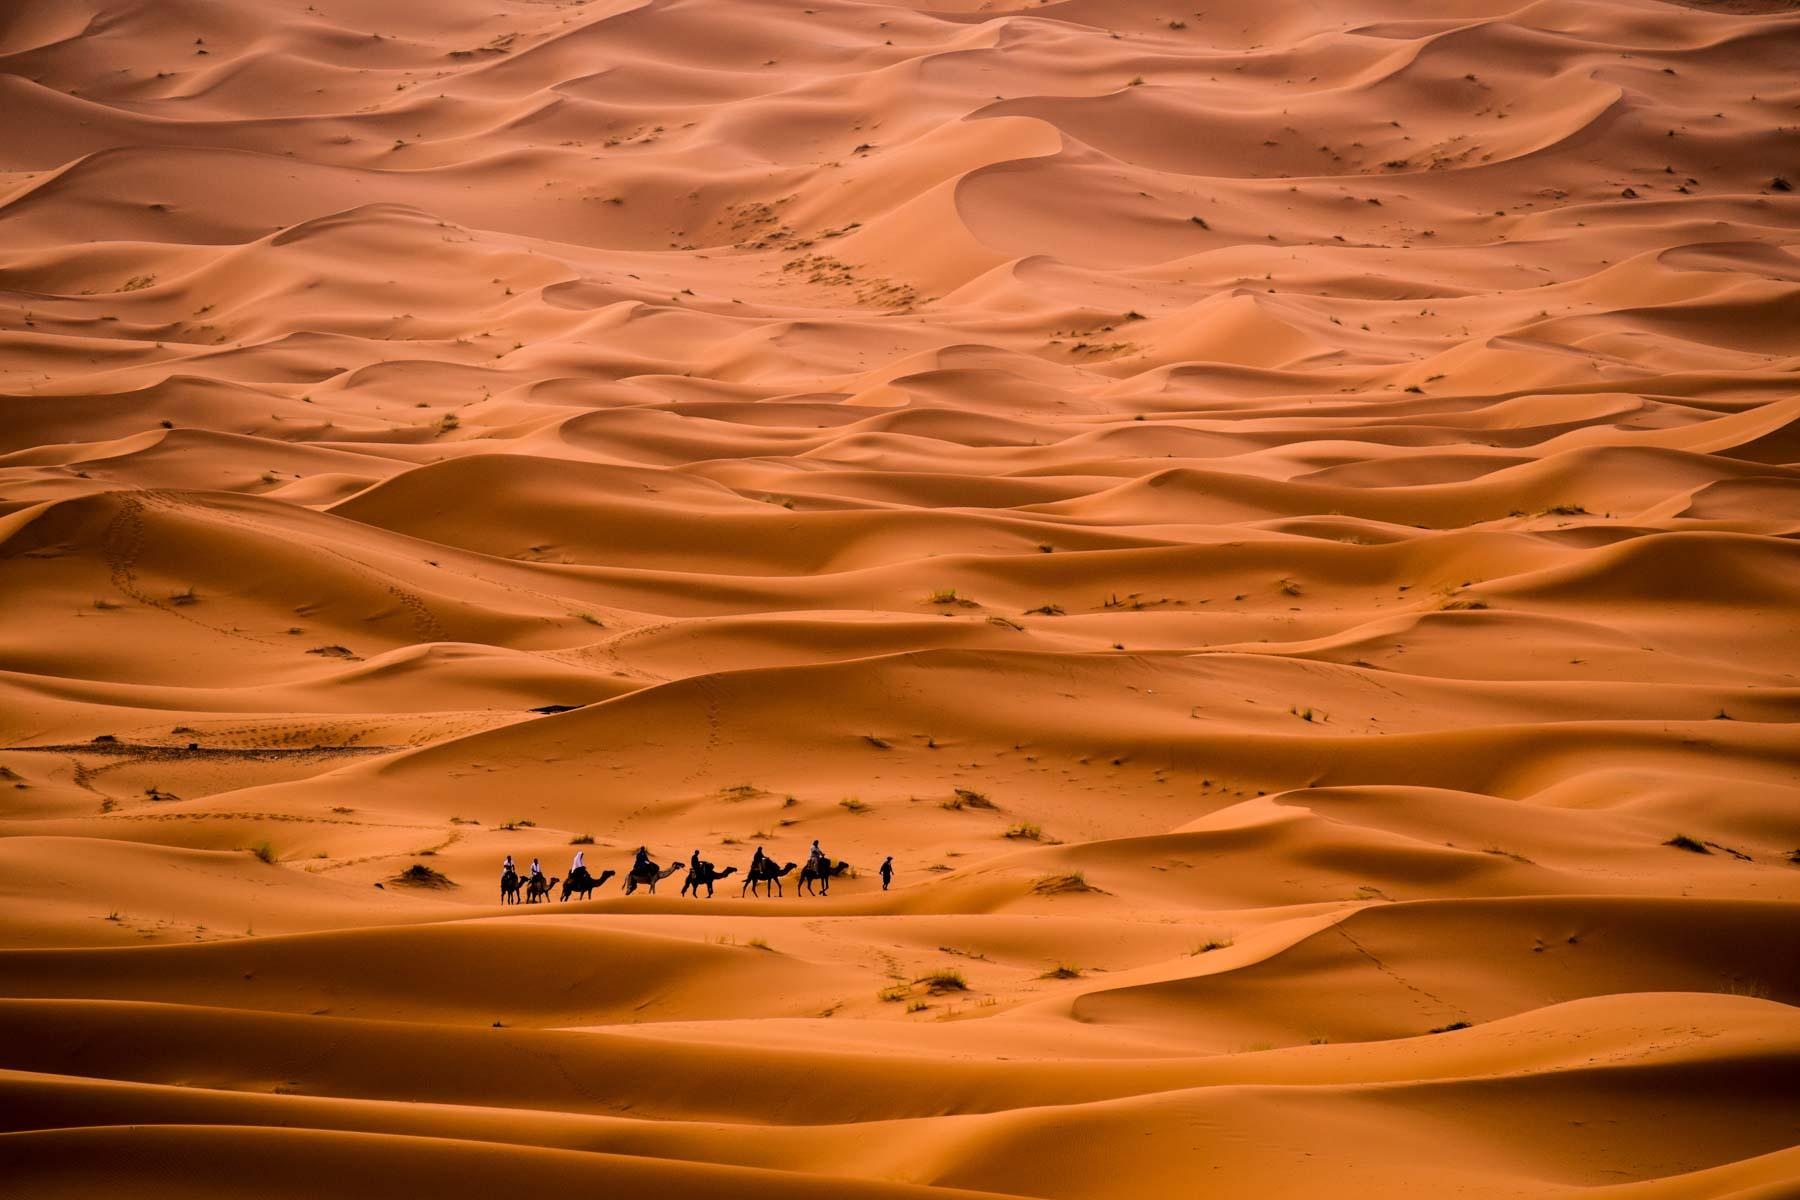 Erin Walker Anderson - Seas of Sand